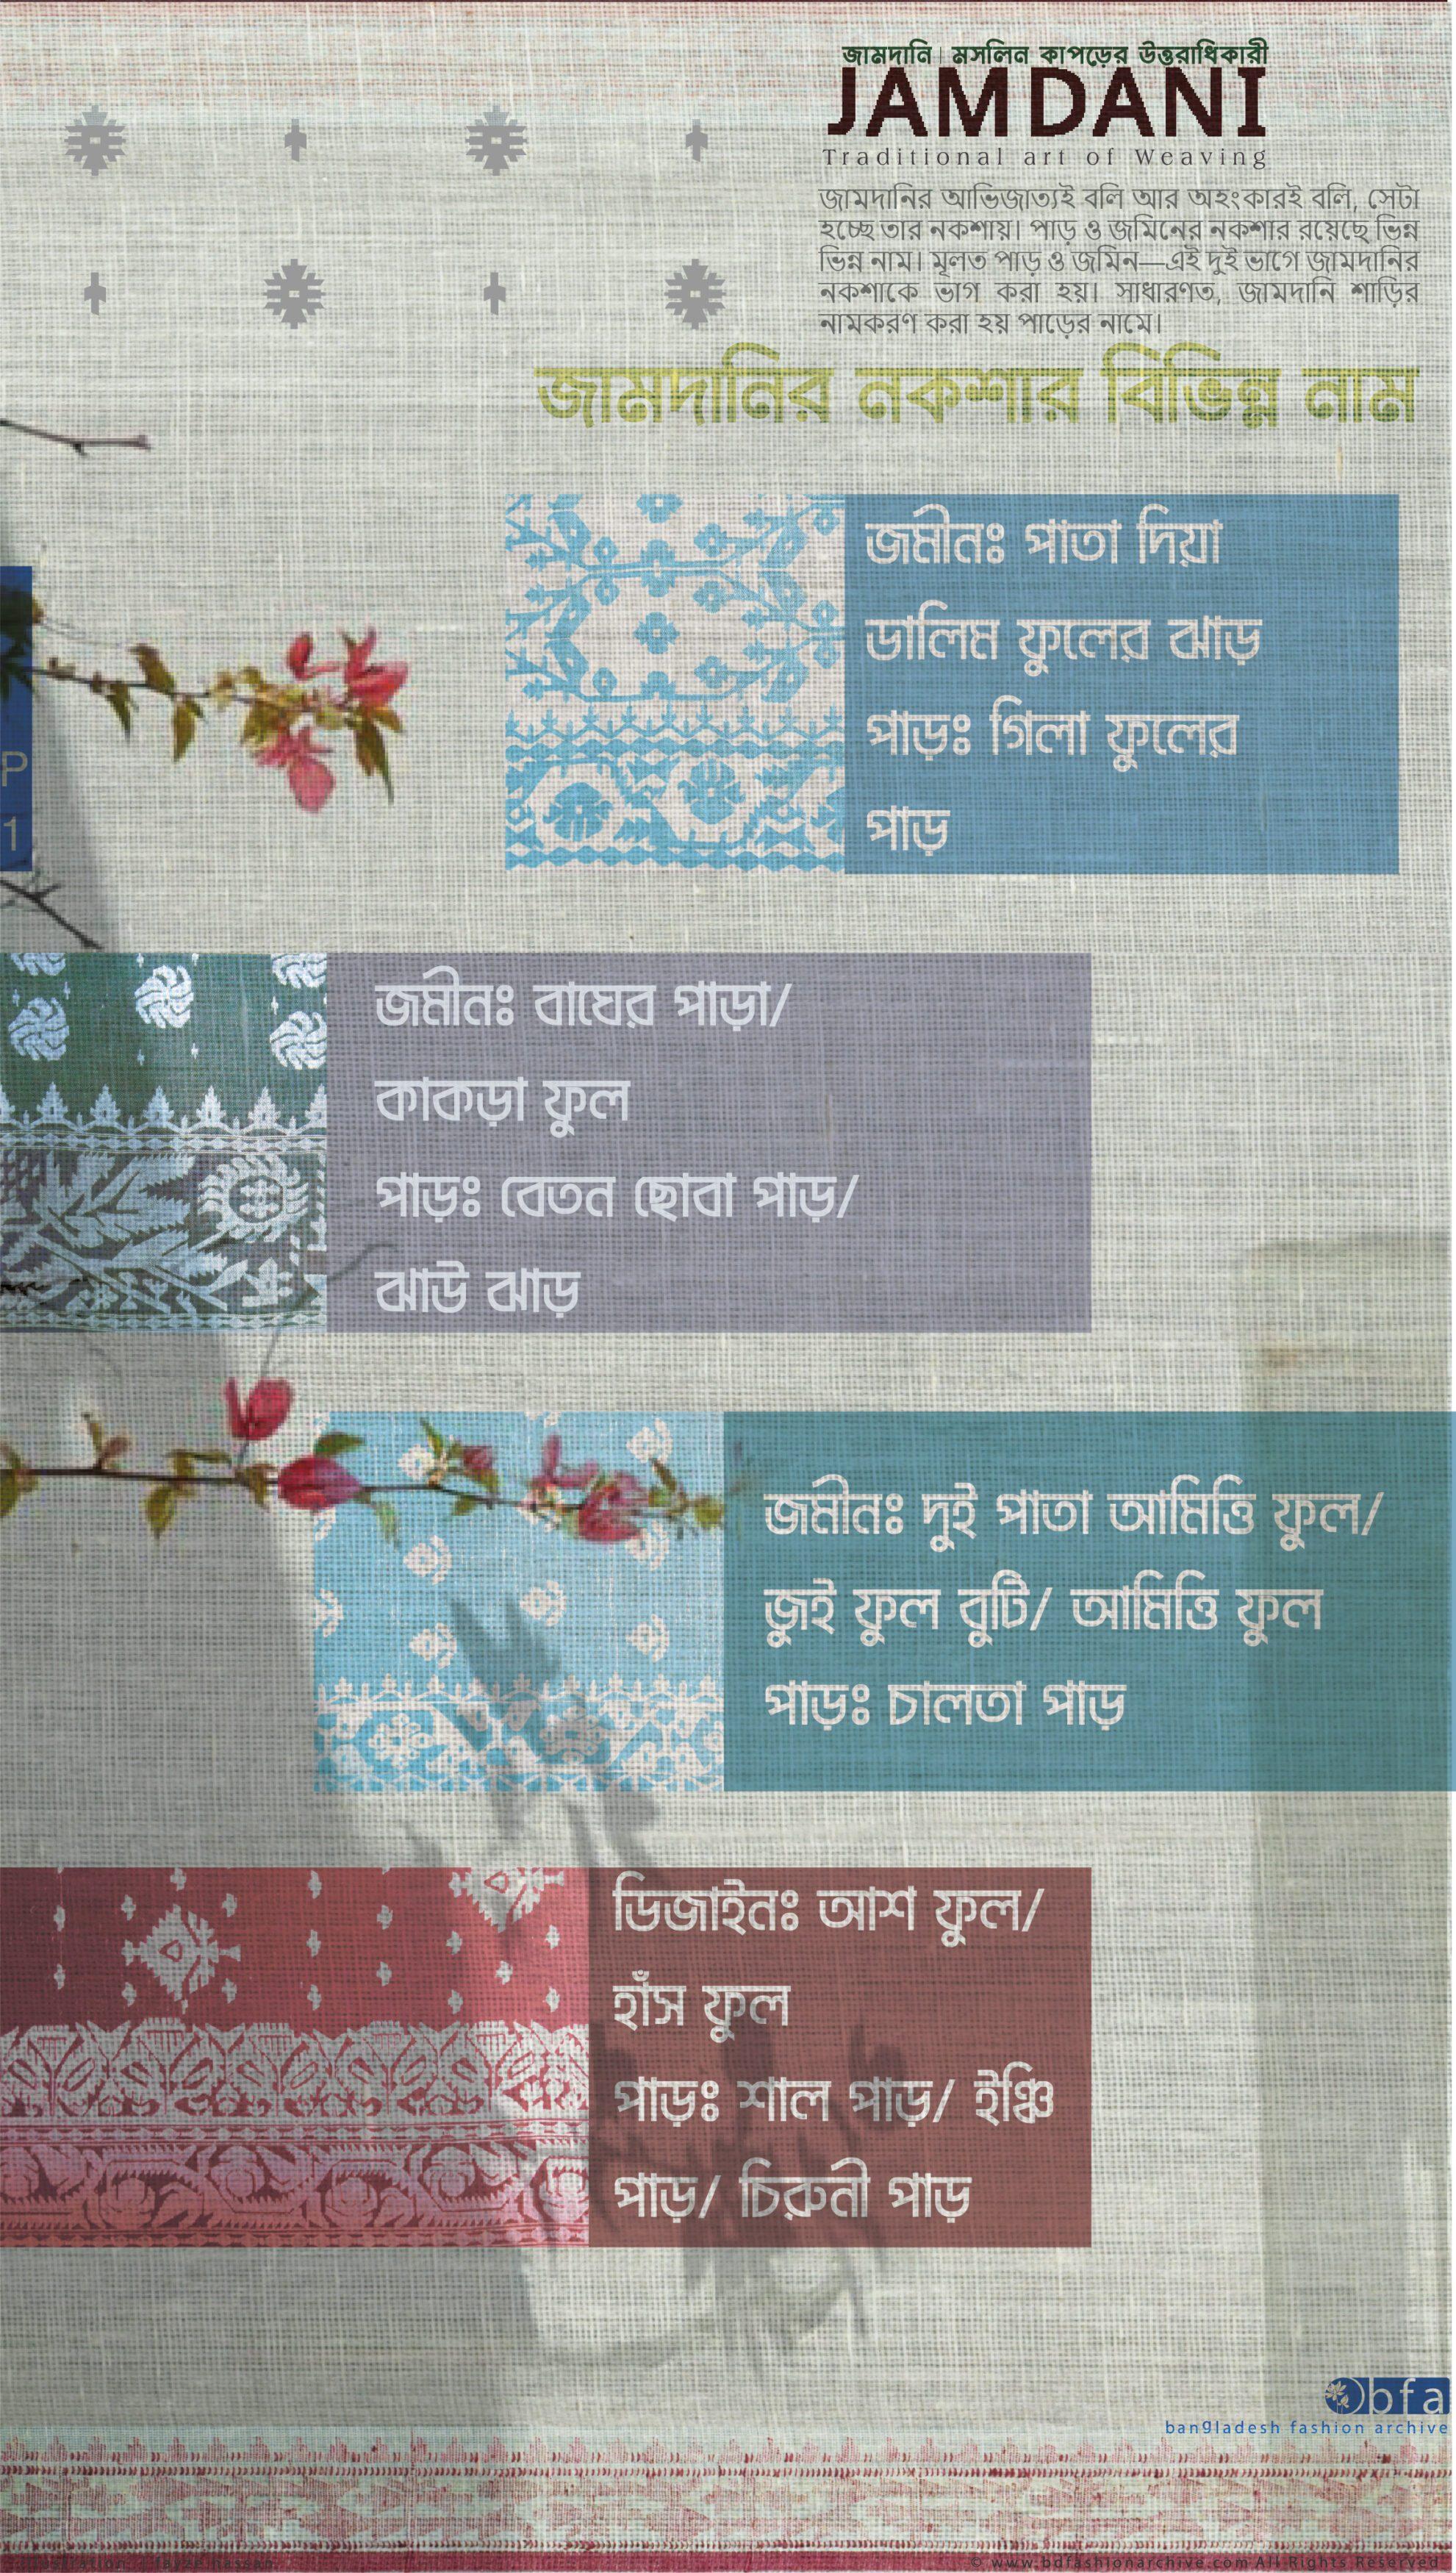 JAMDANI | source of the design | জামদানি নকশার উৎস